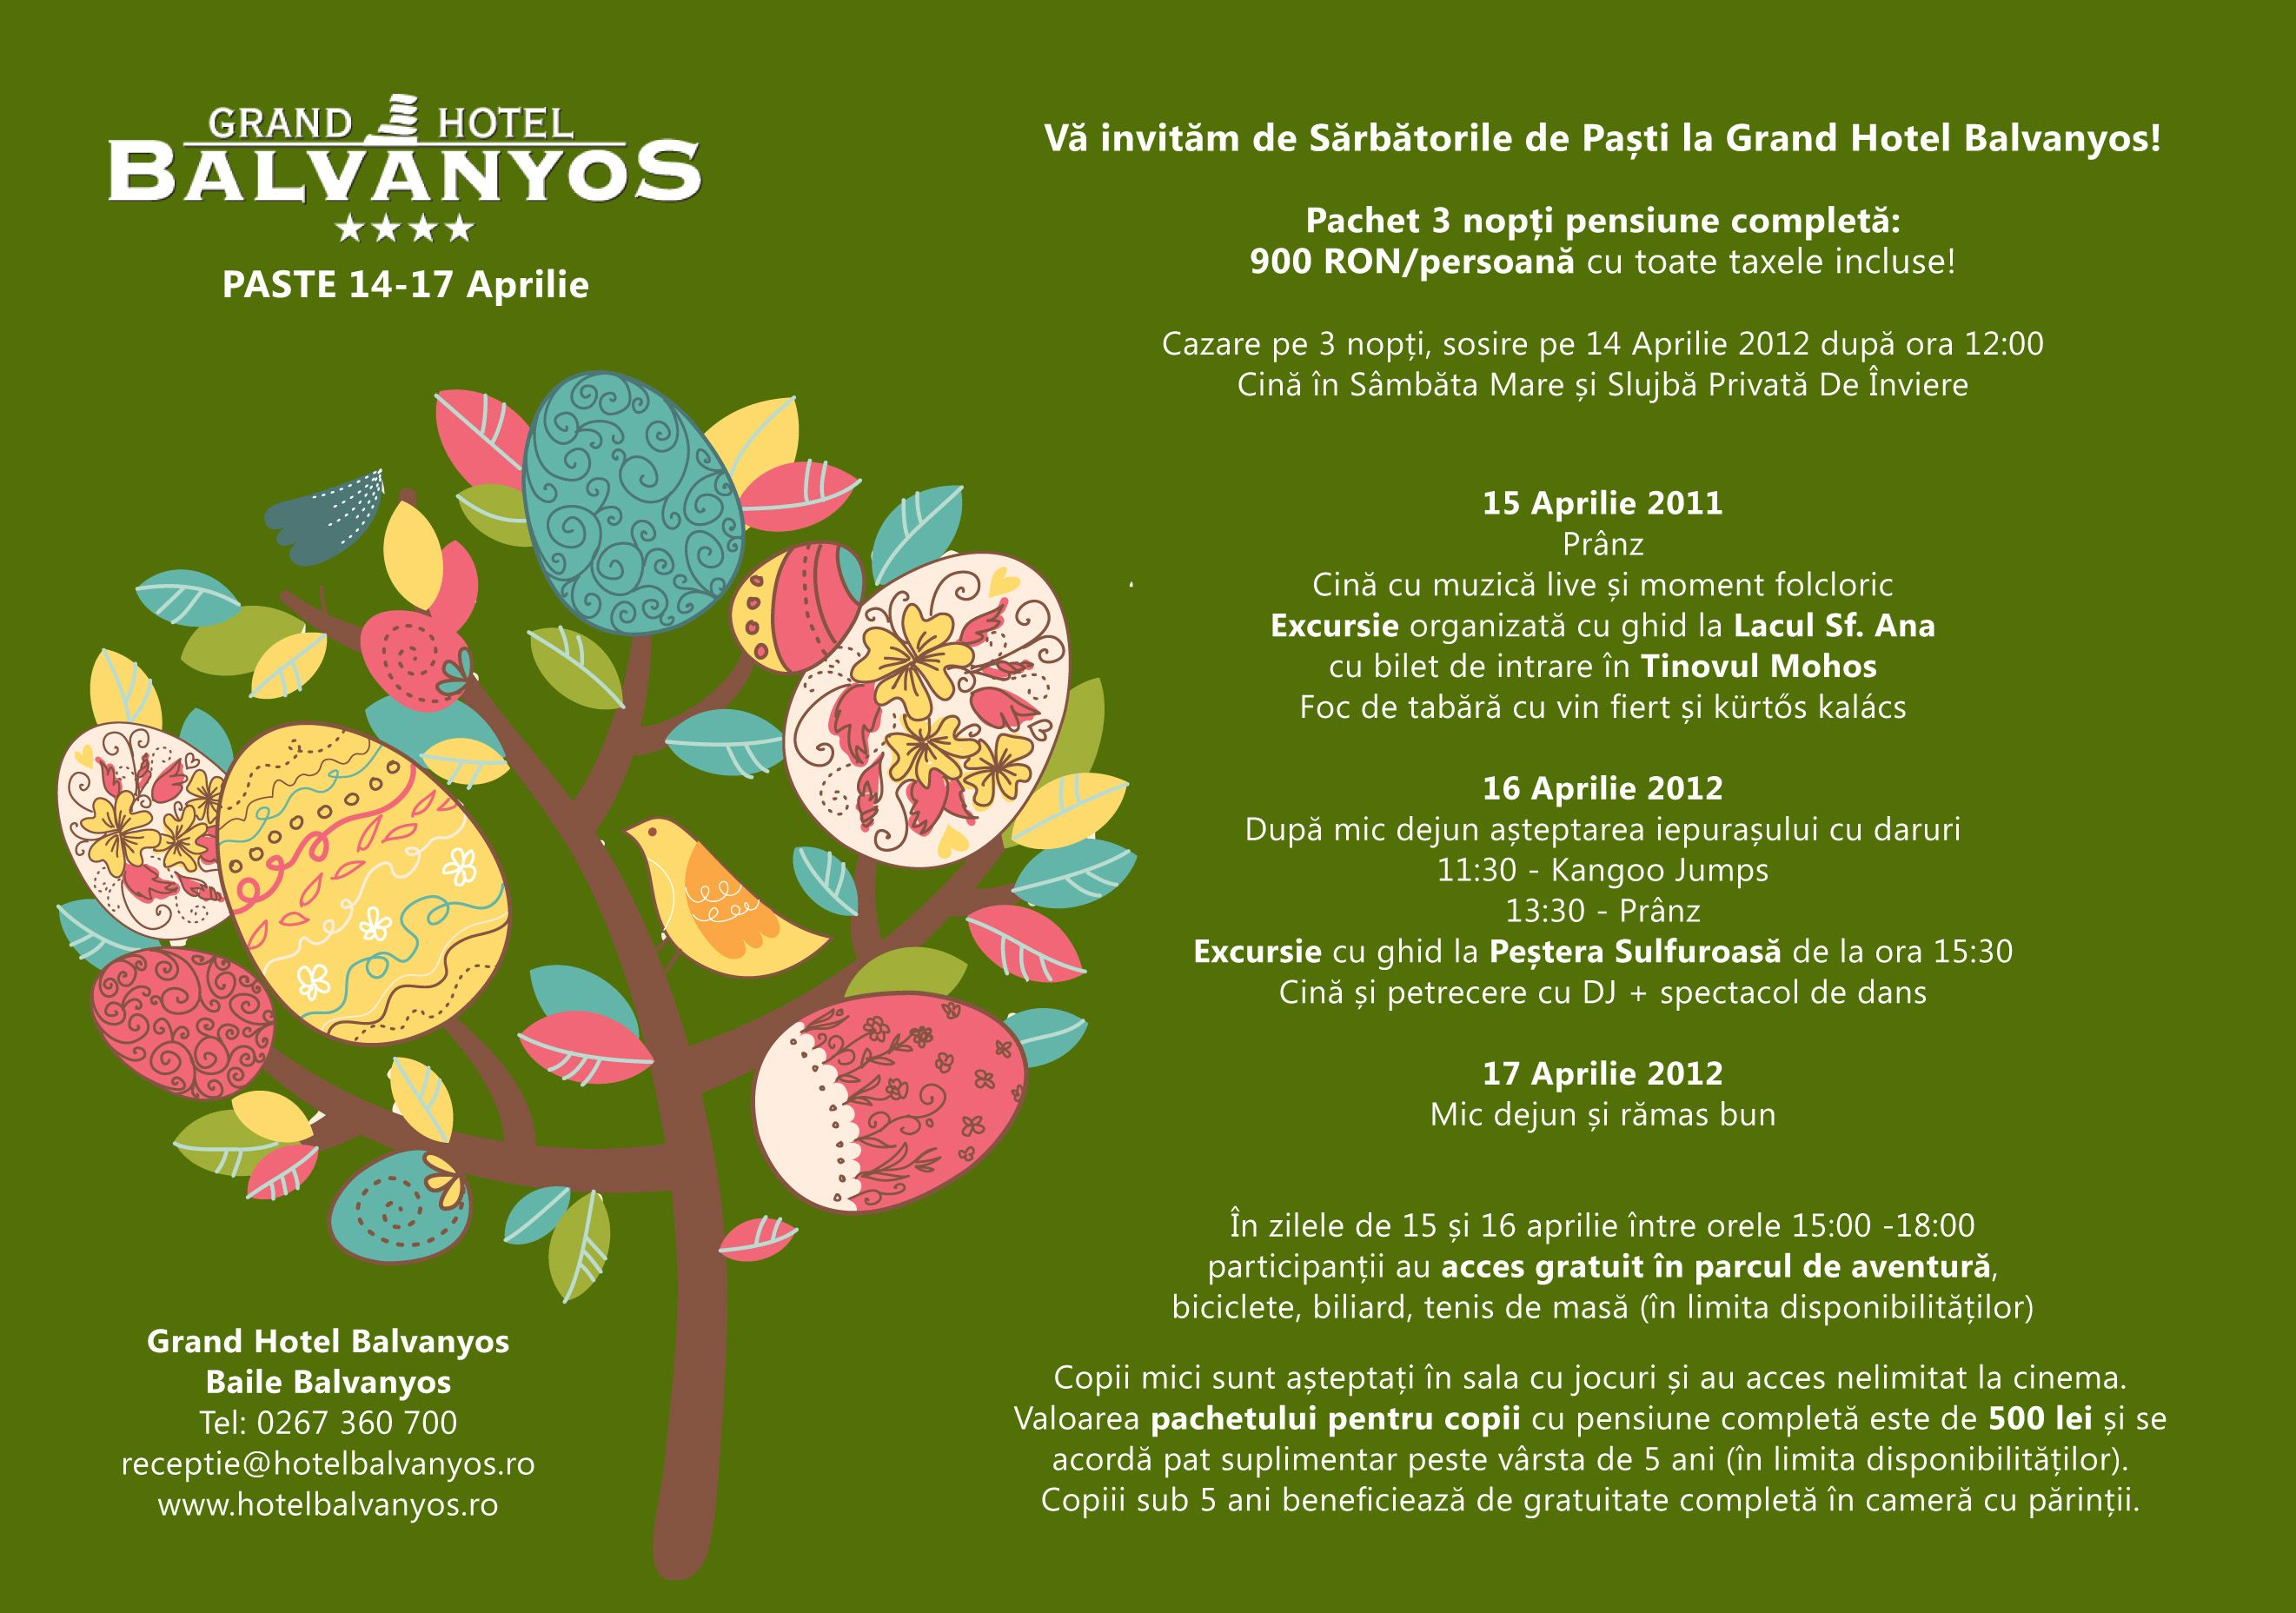 Oferta Paste la Grand Hotel Balvanyos